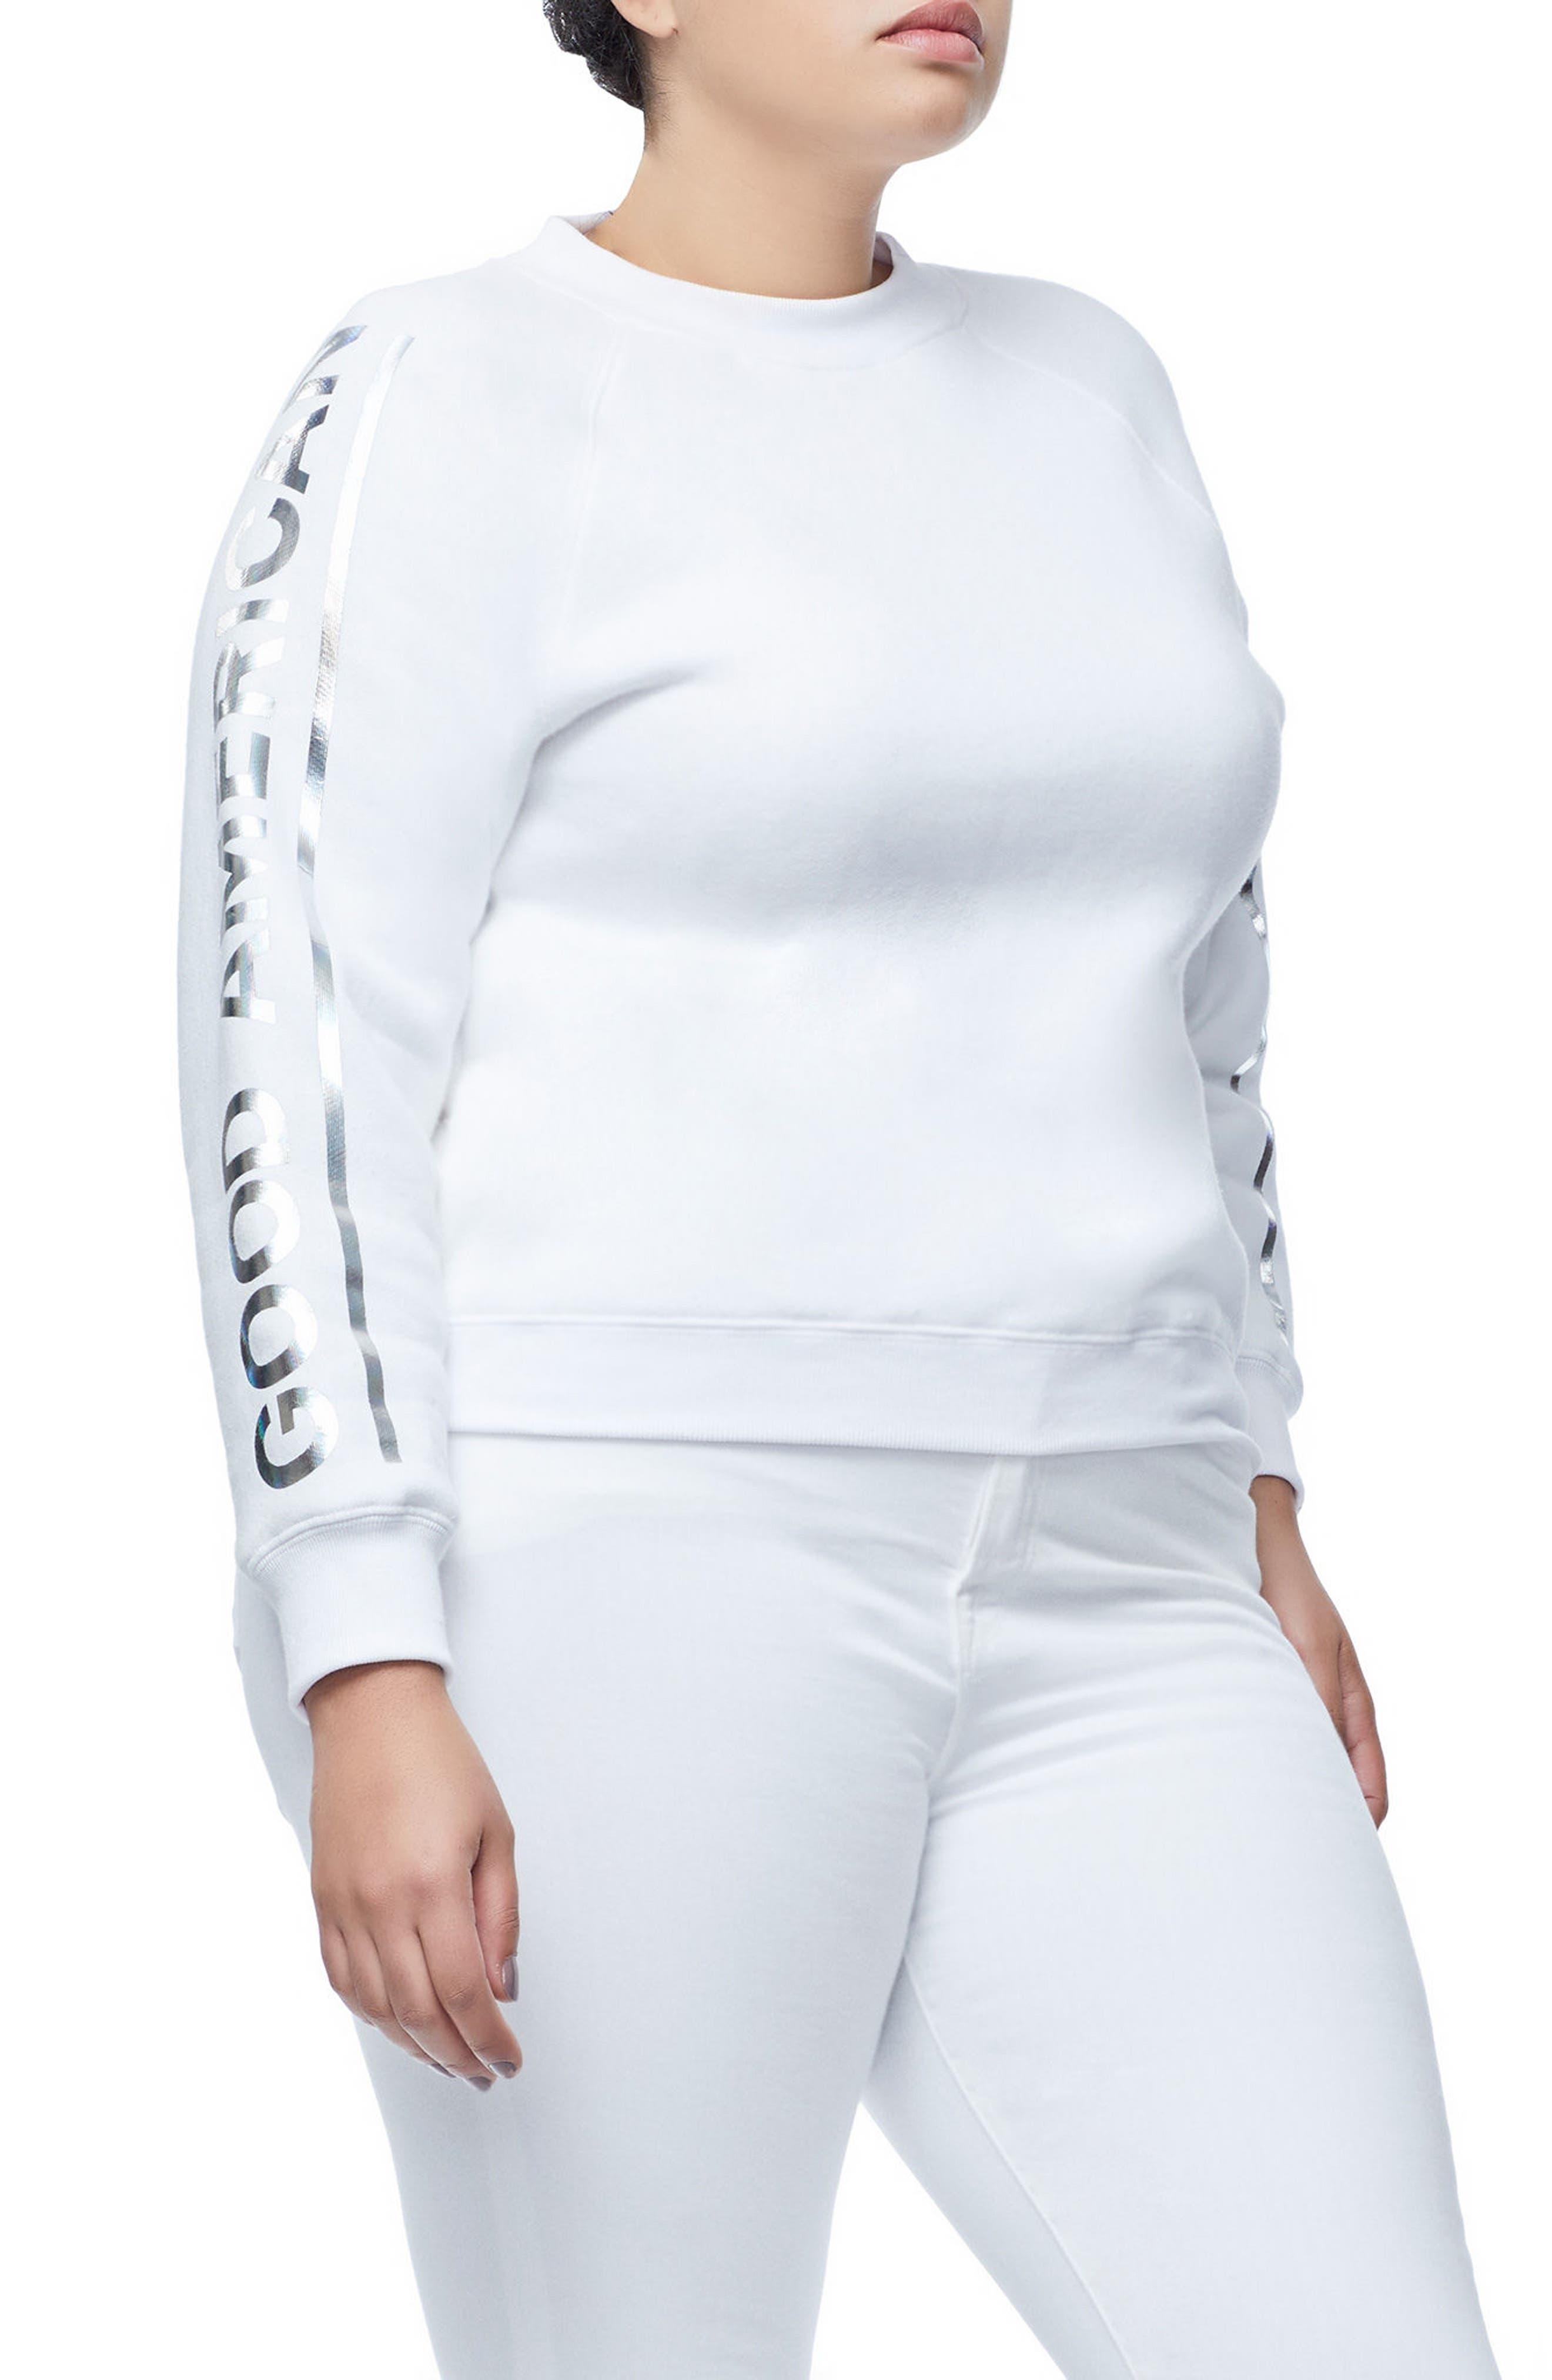 Crewneck Sweatshirt,                             Alternate thumbnail 8, color,                             WHITE